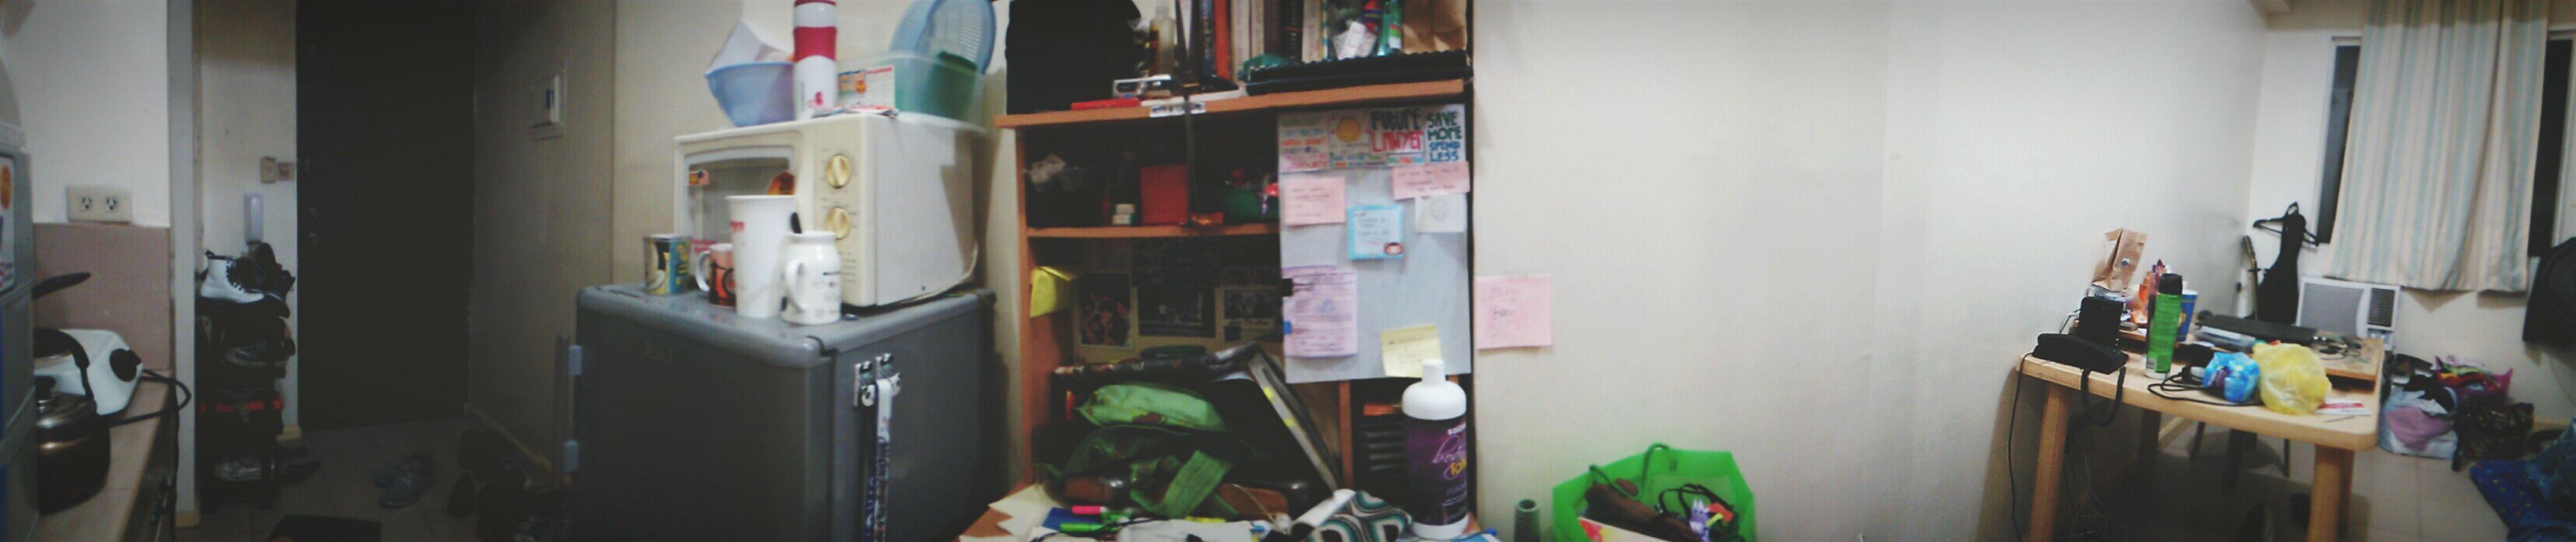 College dorm Collage Collegelife